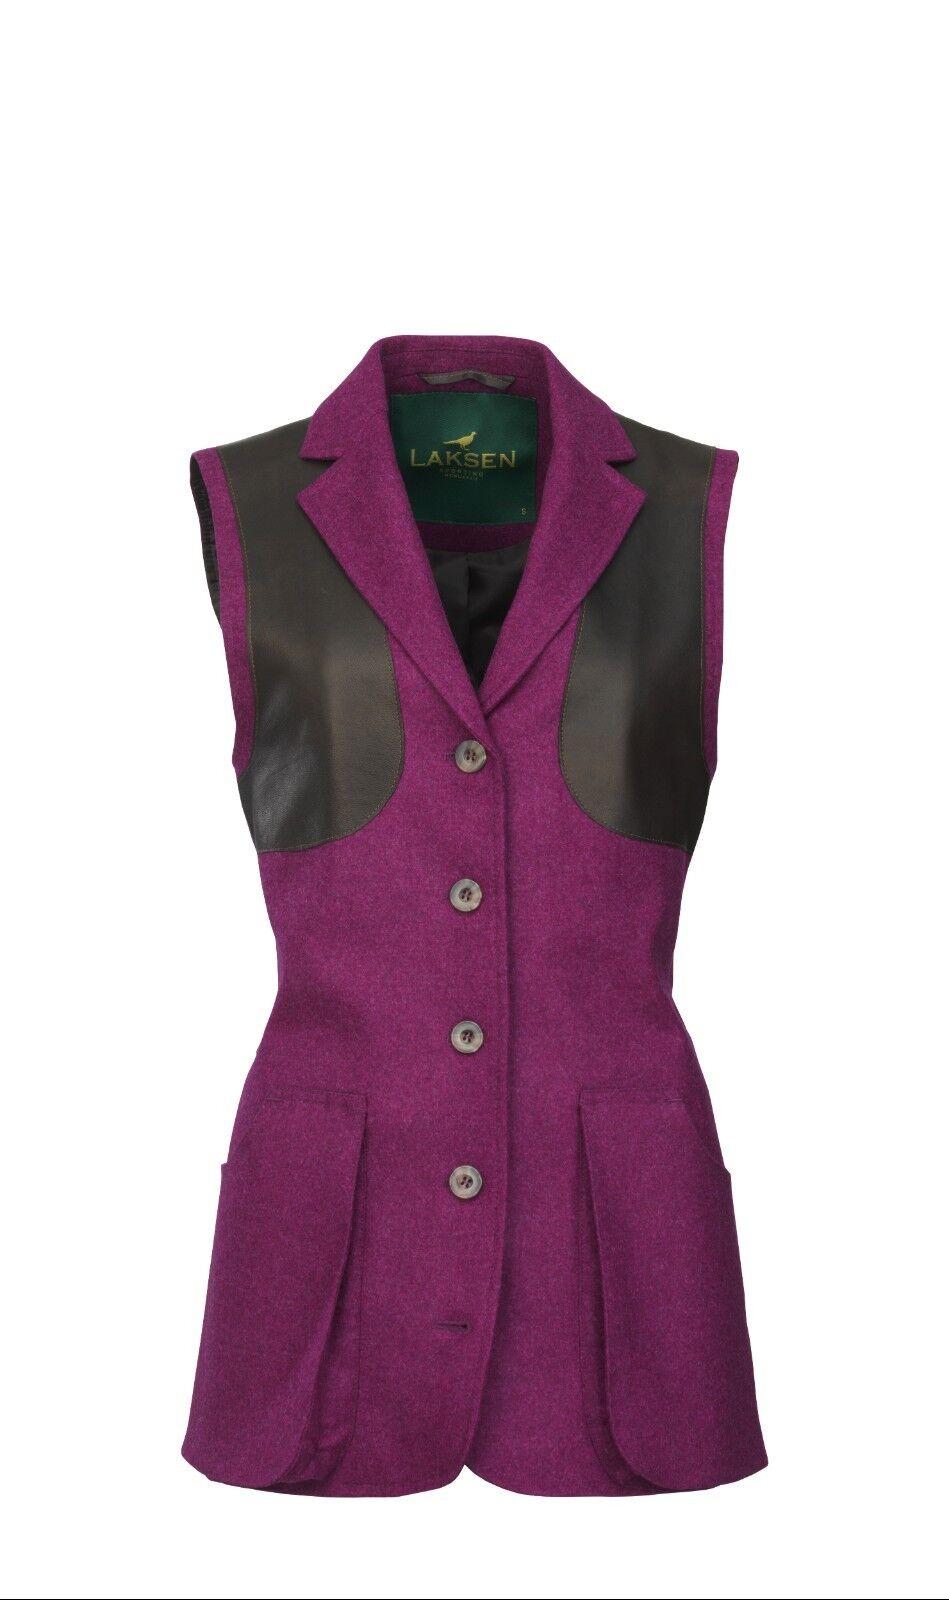 Laksen Ladies Normandy Tailor Shooting Vest REDUCED